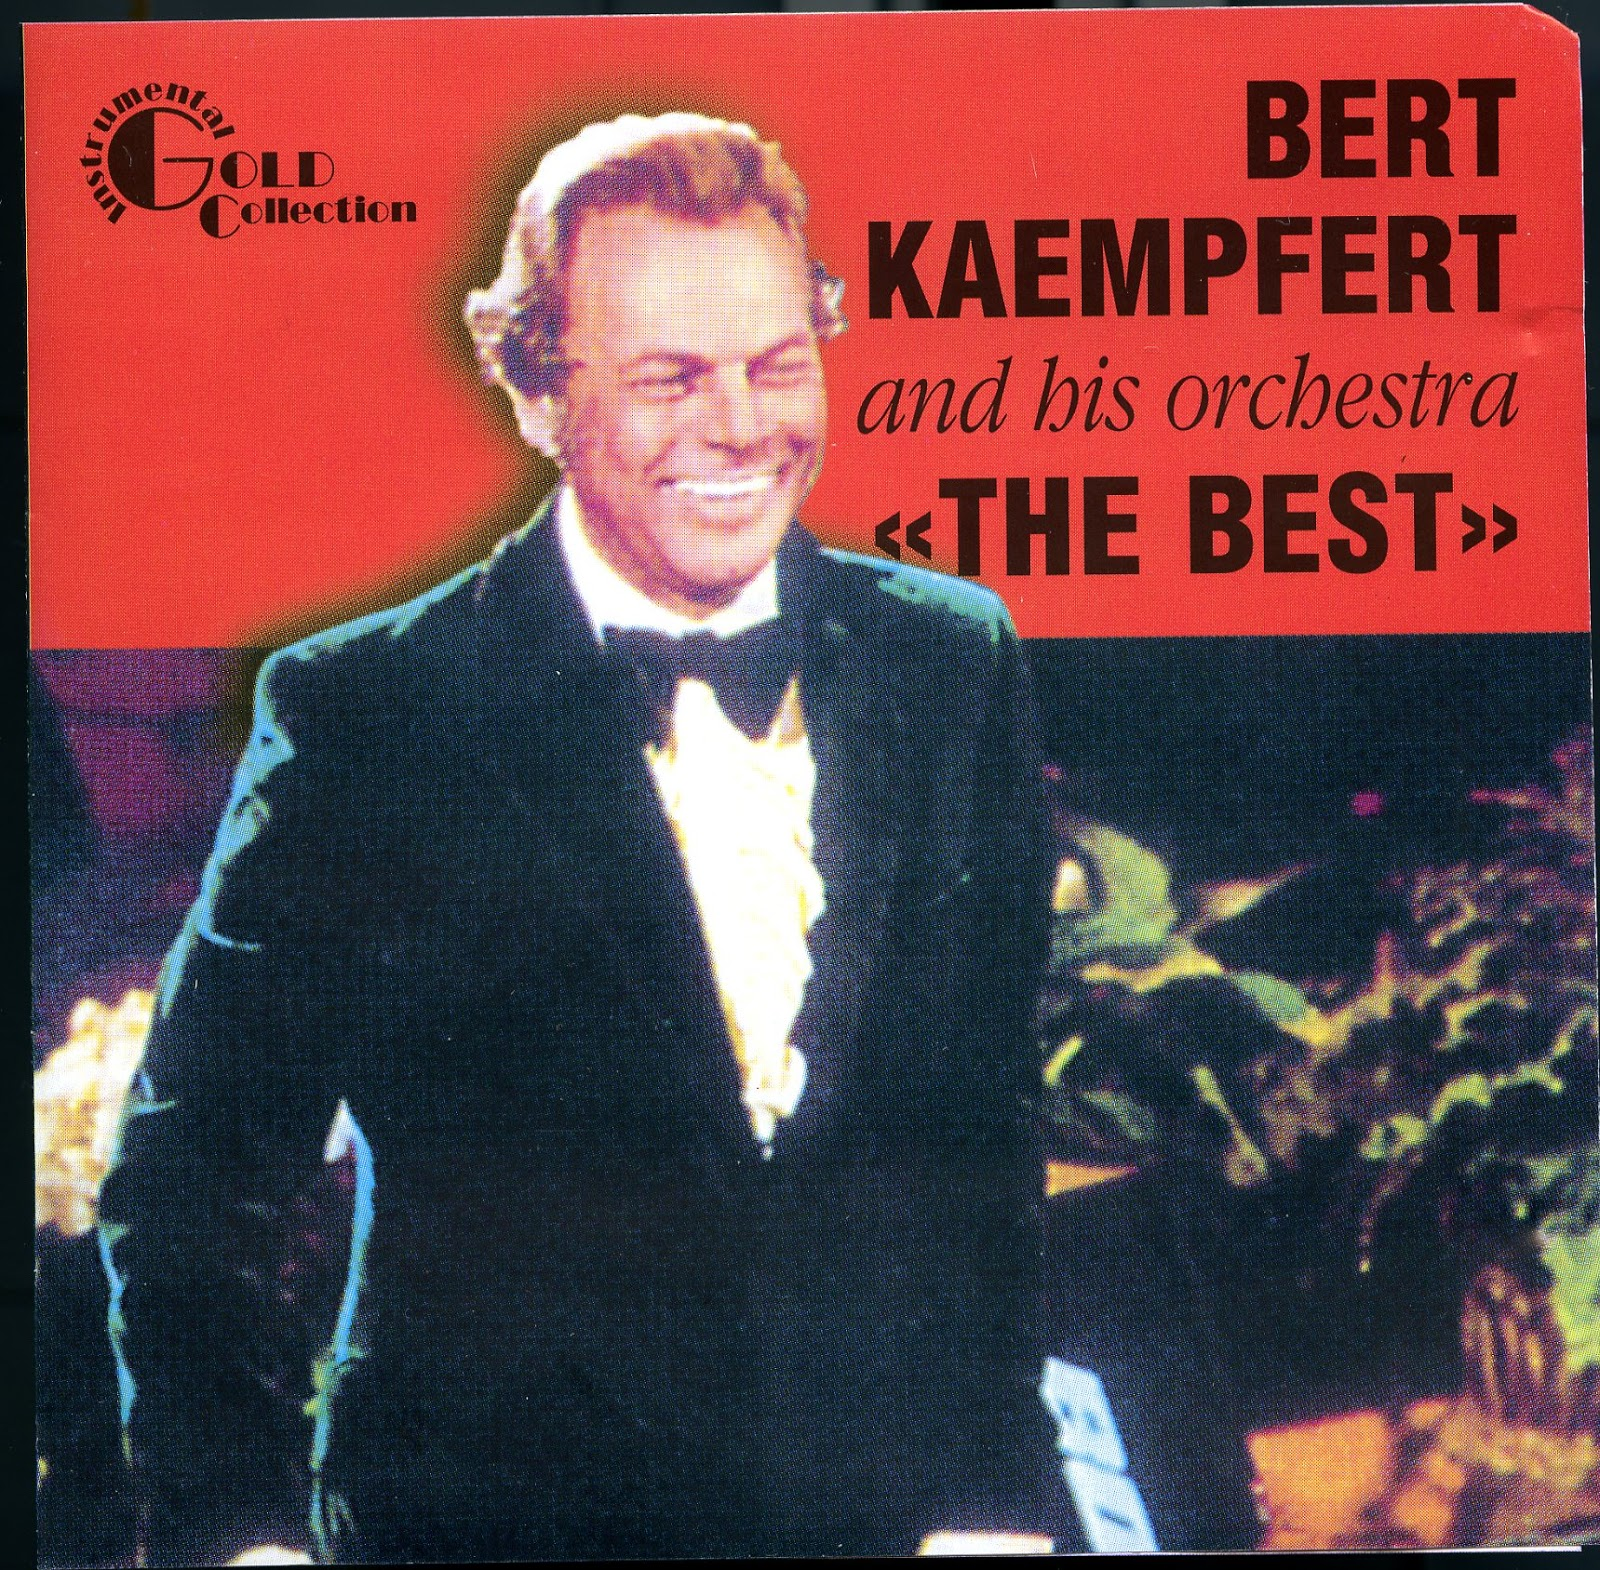 Bert Kaempfert And His Orchestra Afrikaan Beat And Other Favorites